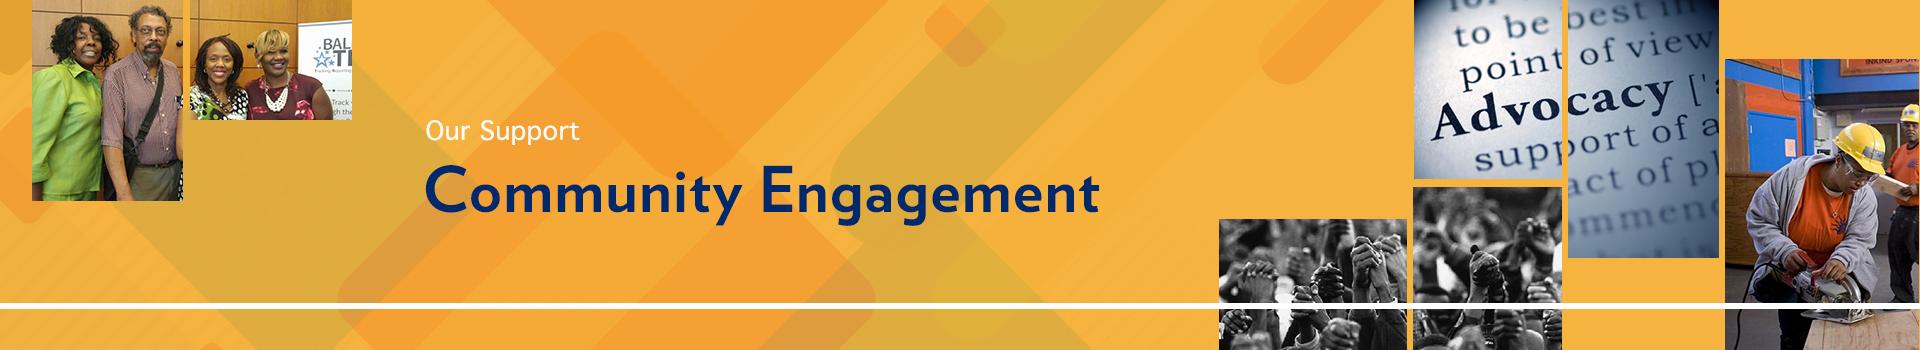 Community Engagement banner